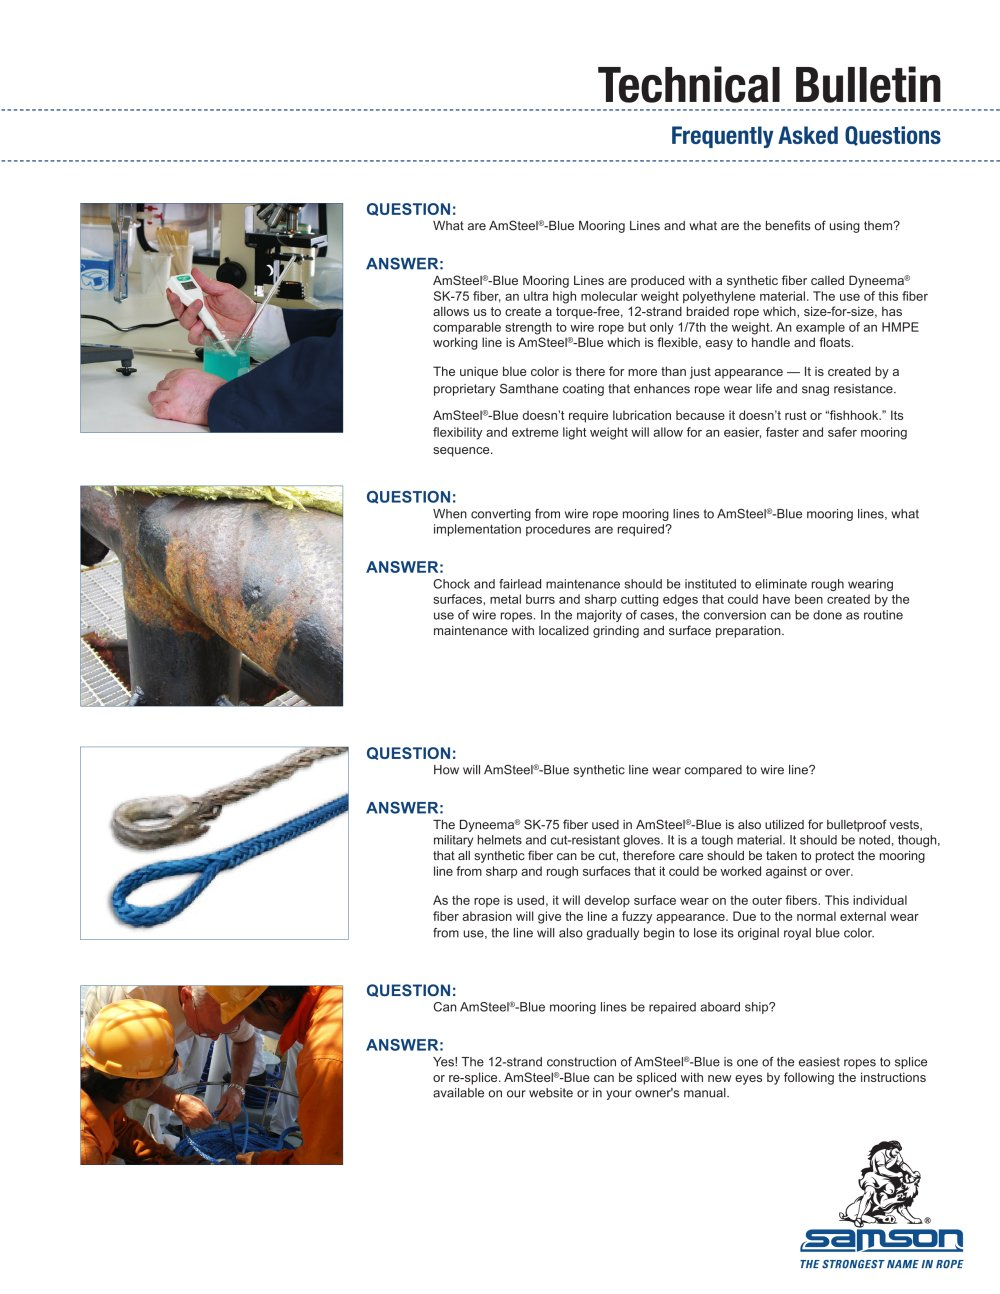 AmSteel-Blue - Samson - PDF Catalogues | Documentation | Boating ...